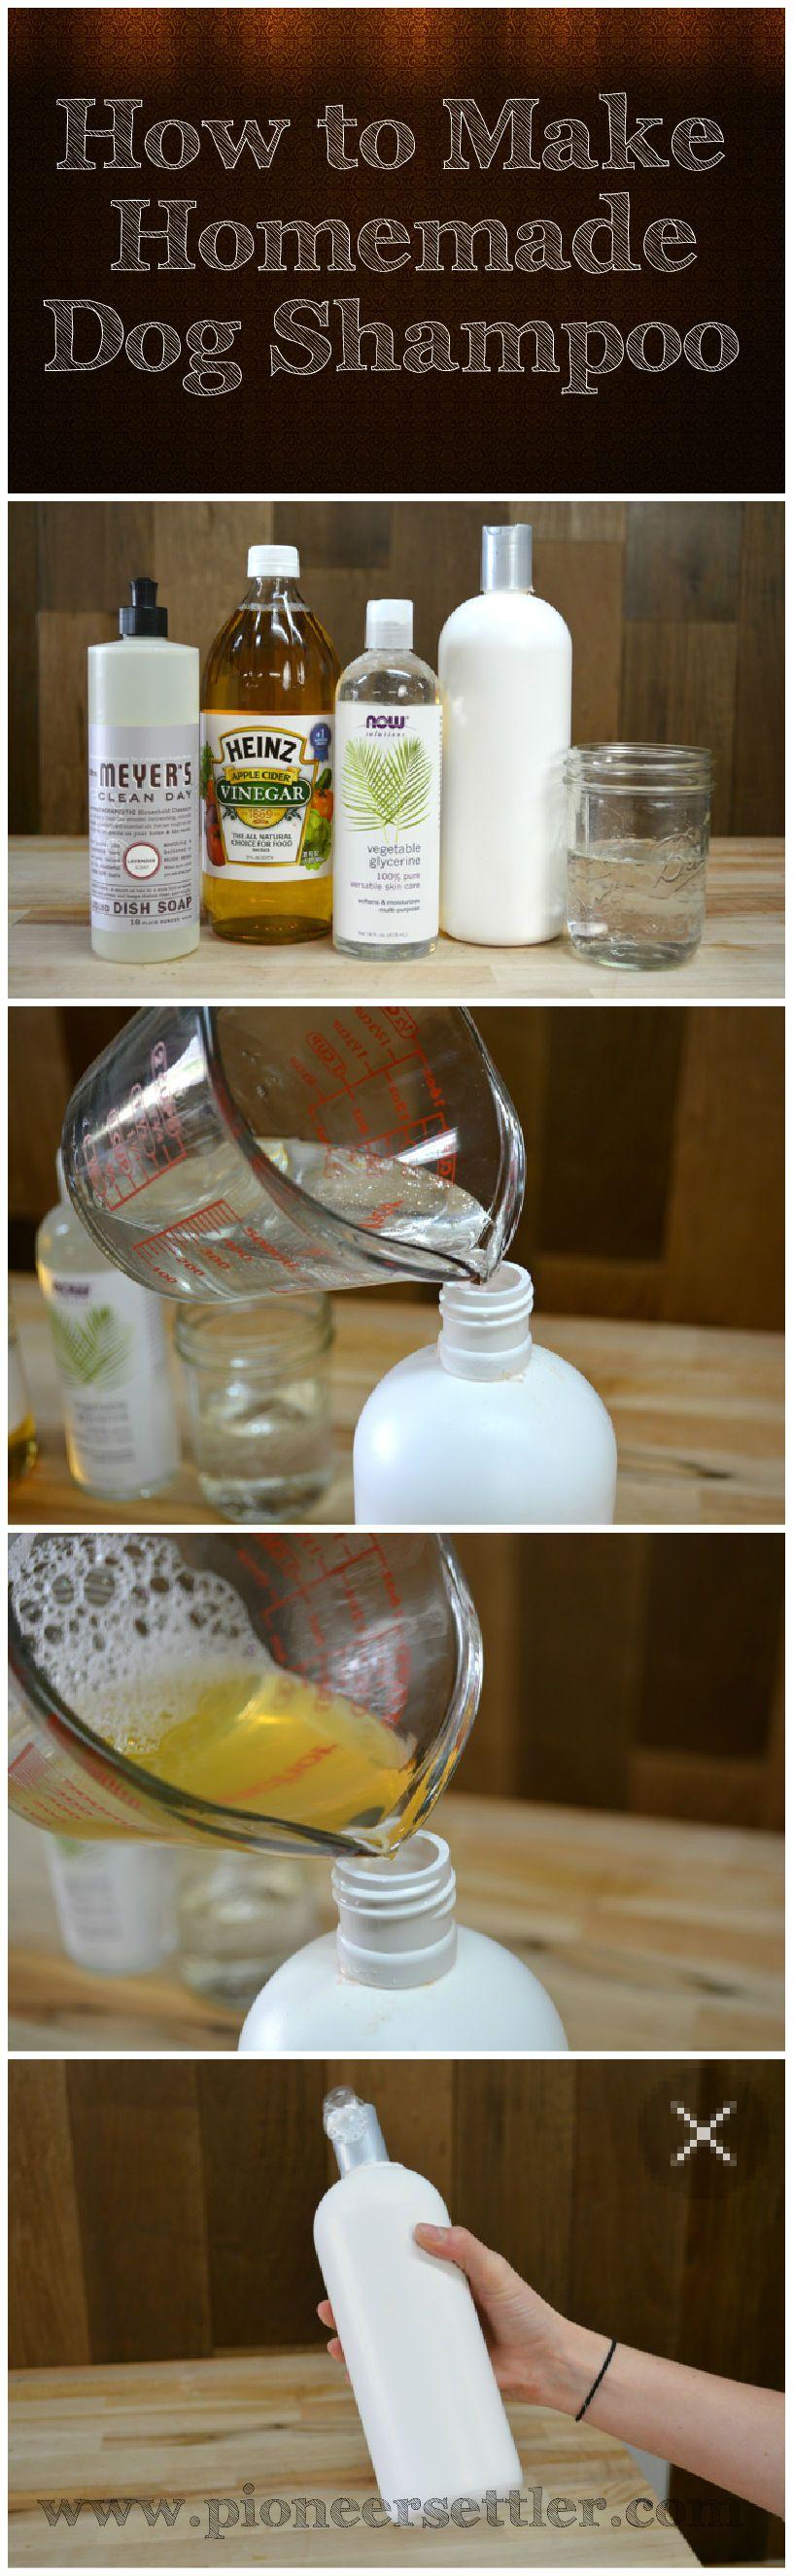 How To Make Homemade Dog Shampoo Homesteading Dog